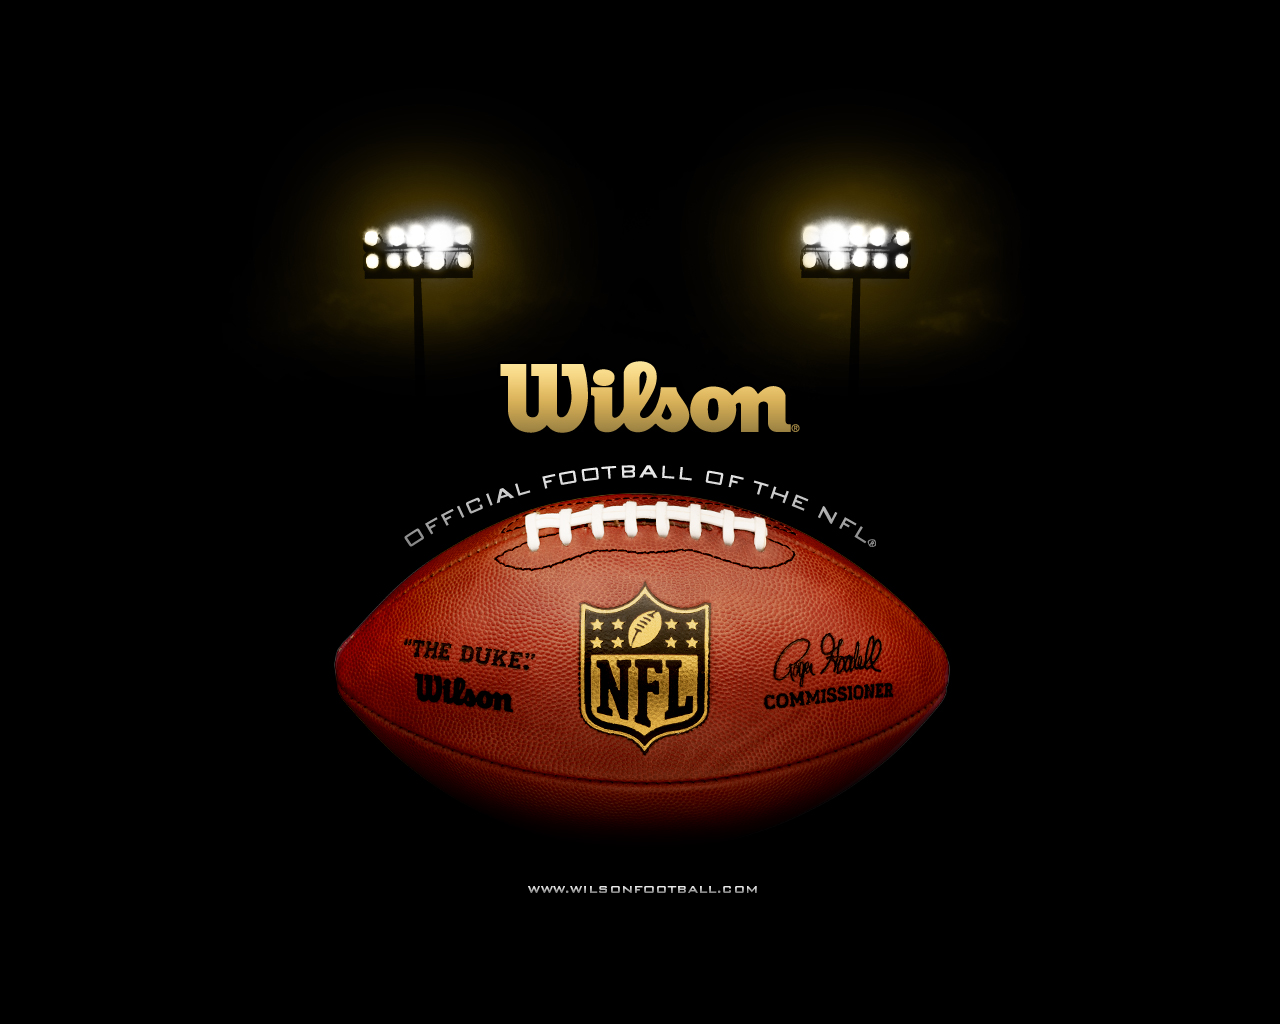 NFL screen savers to download NFL screen NFL Team 1280x1024